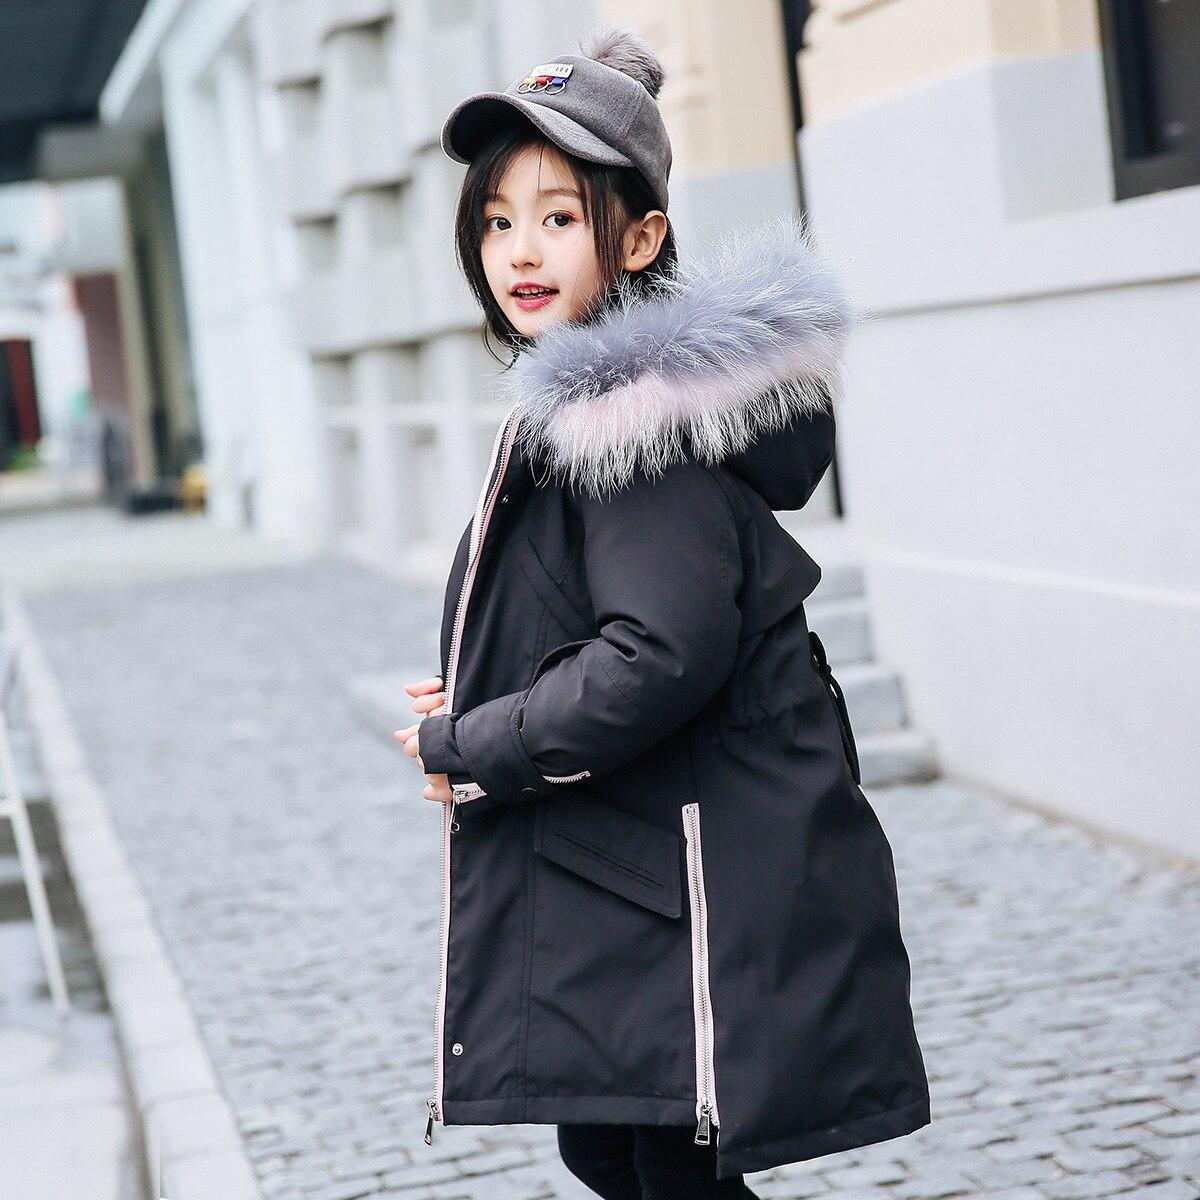 2019 Teenage Children's Girl Down Jacket Fashion Girl's Long Winter Warm Outdoor Thick Jacket Girl  Windproof Coat Snowsuits